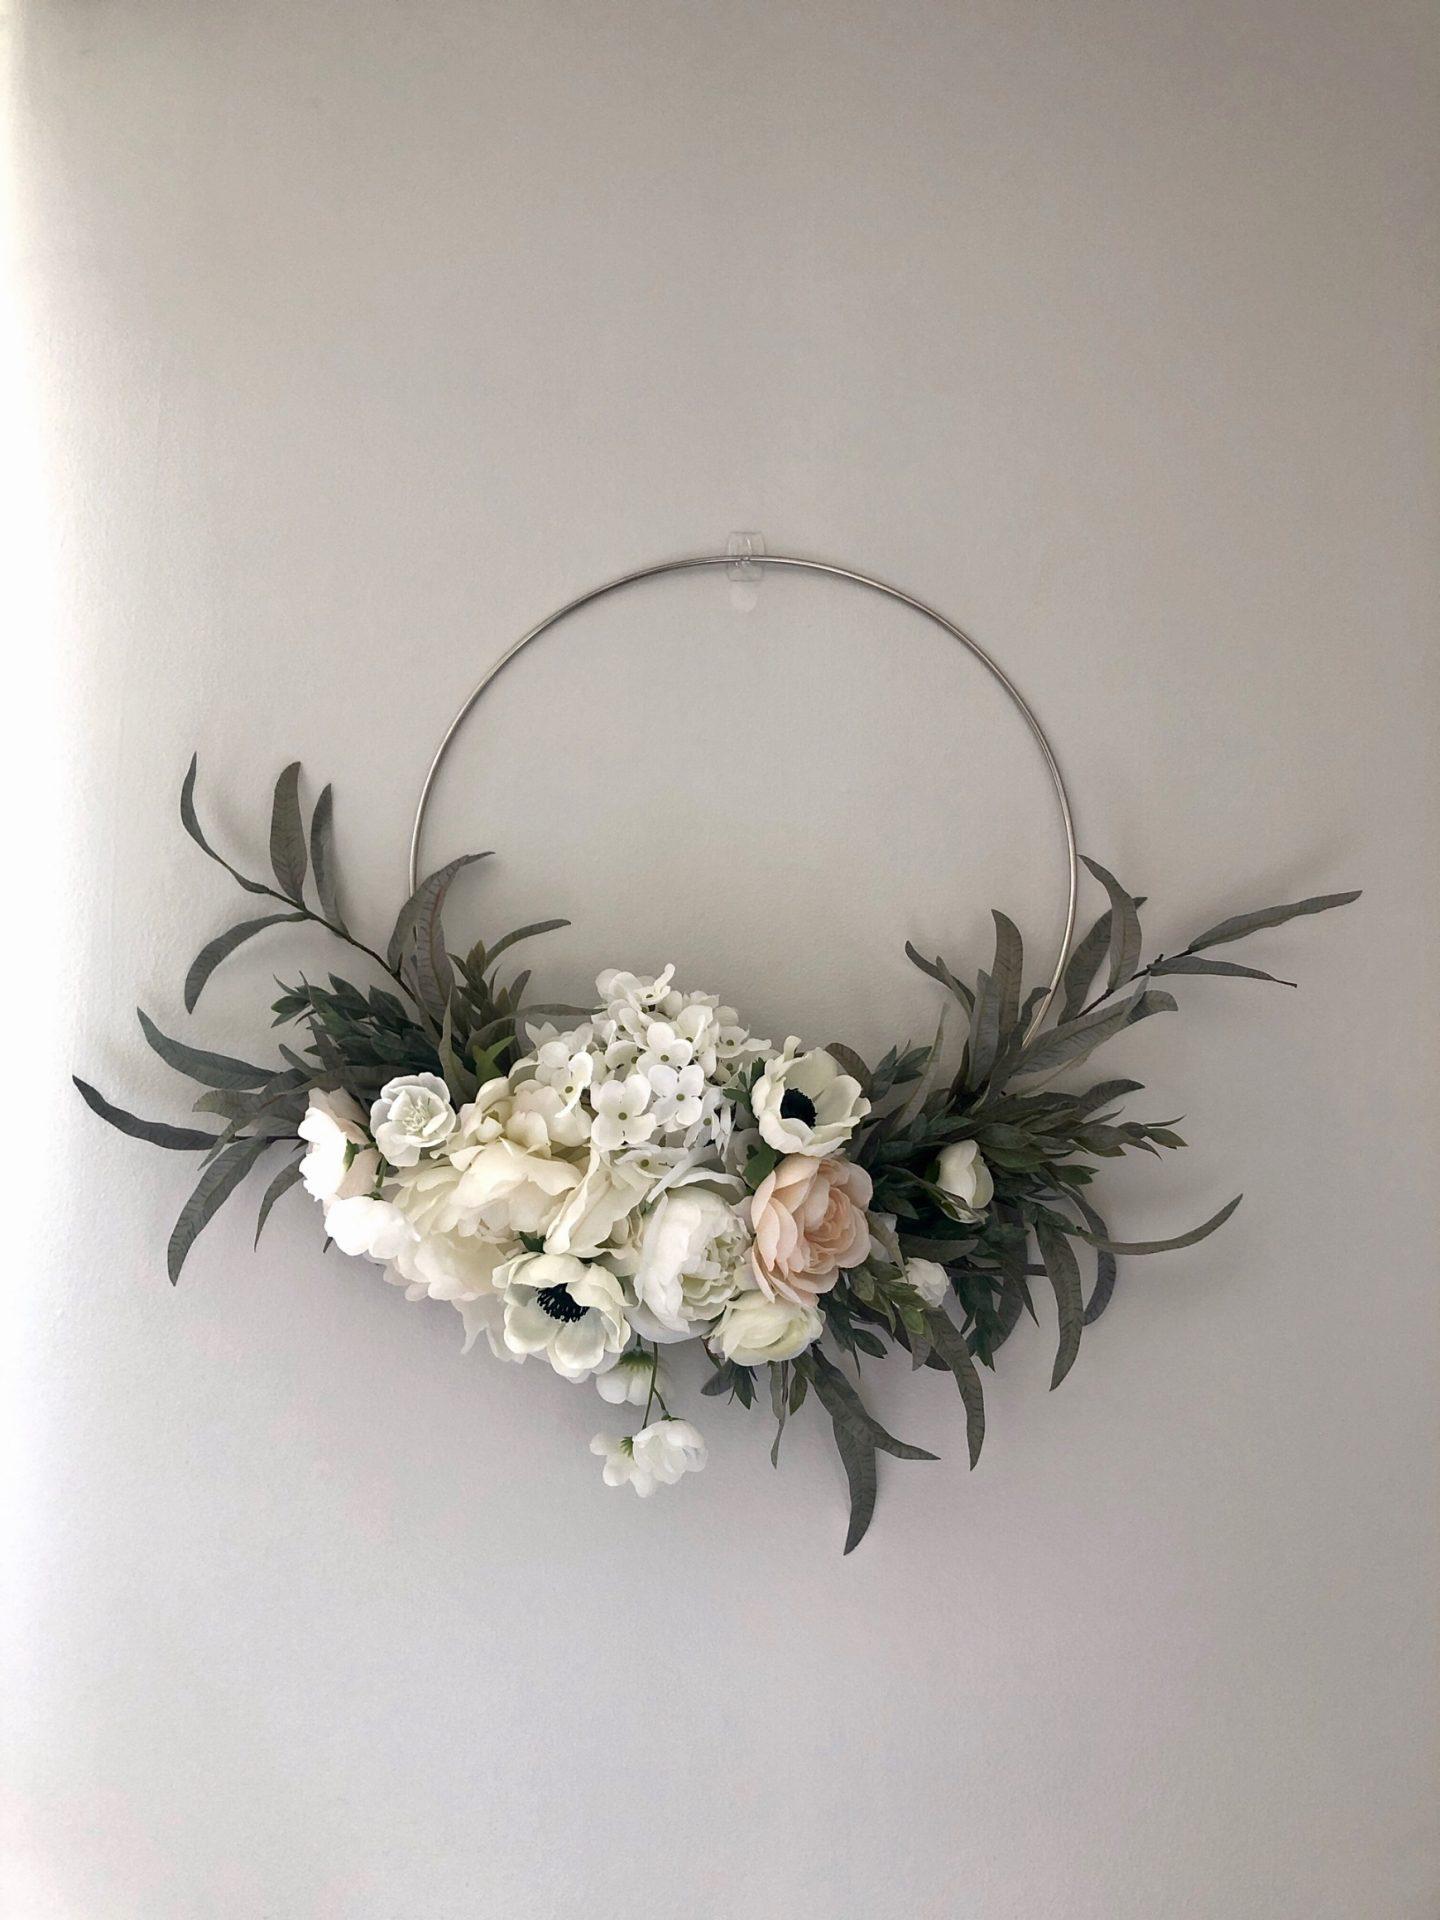 Modern Spring white peony & anemone wreath